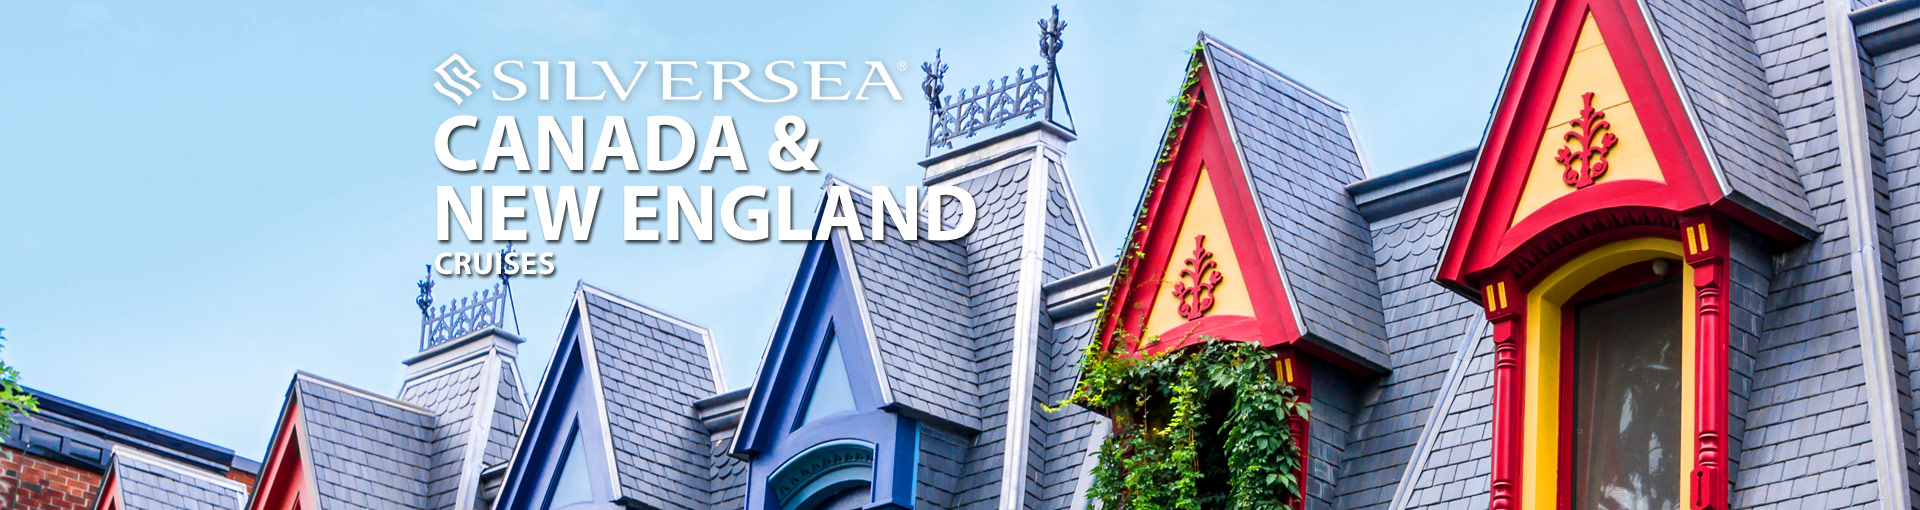 Silversea Cruises Canada / New England Cruises